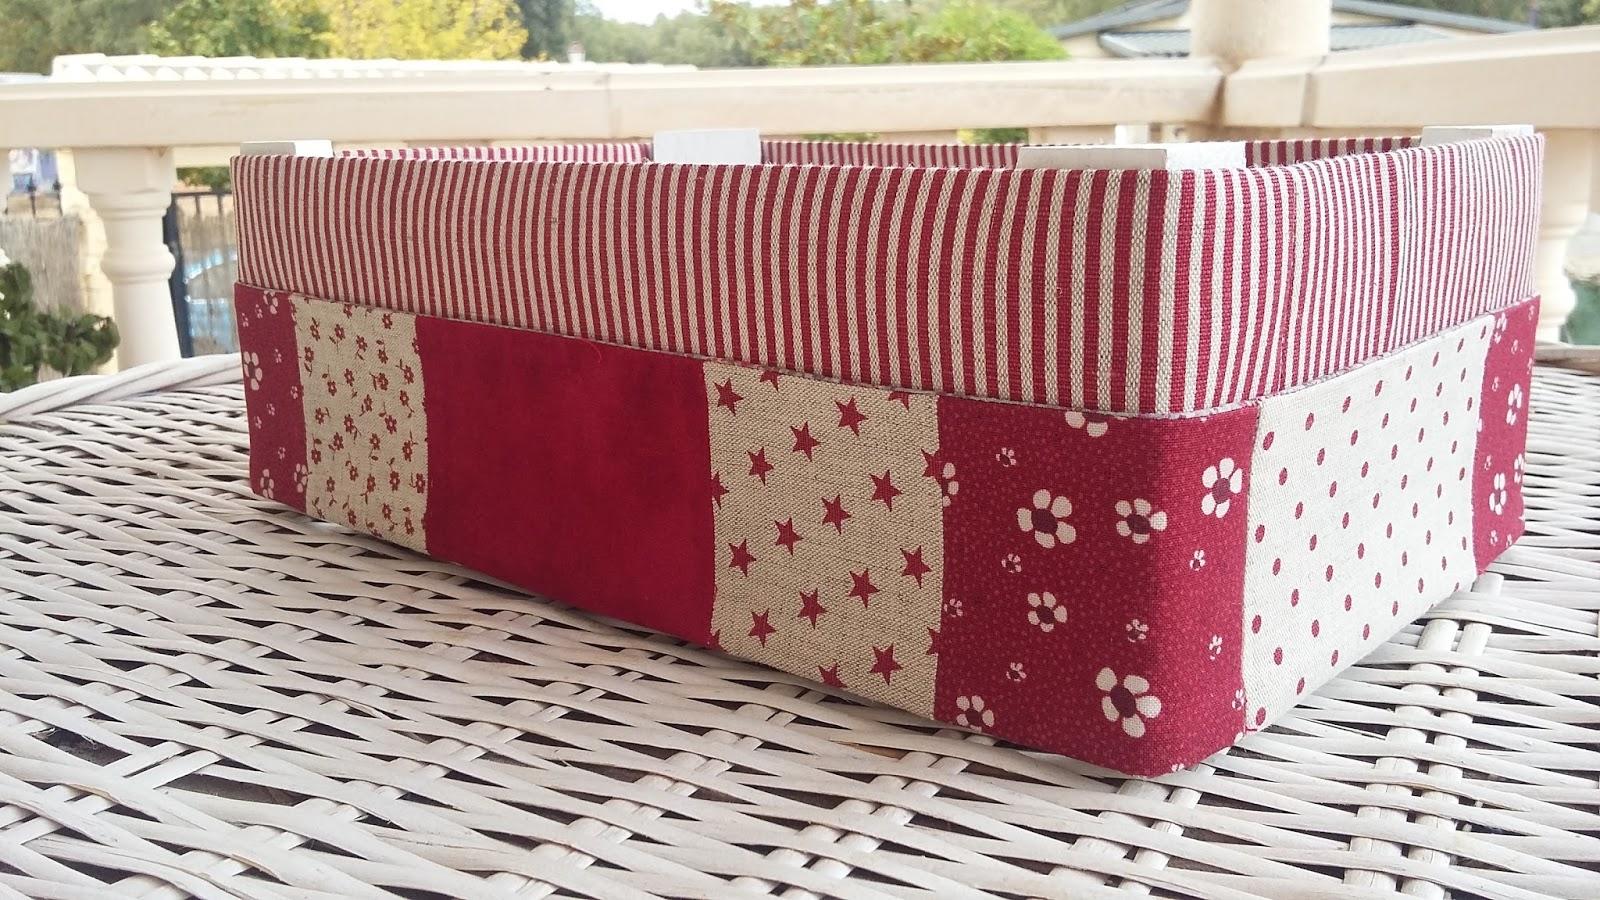 Flor de minuto como forrar una caja de fresas for Forrar cajas de carton con tela